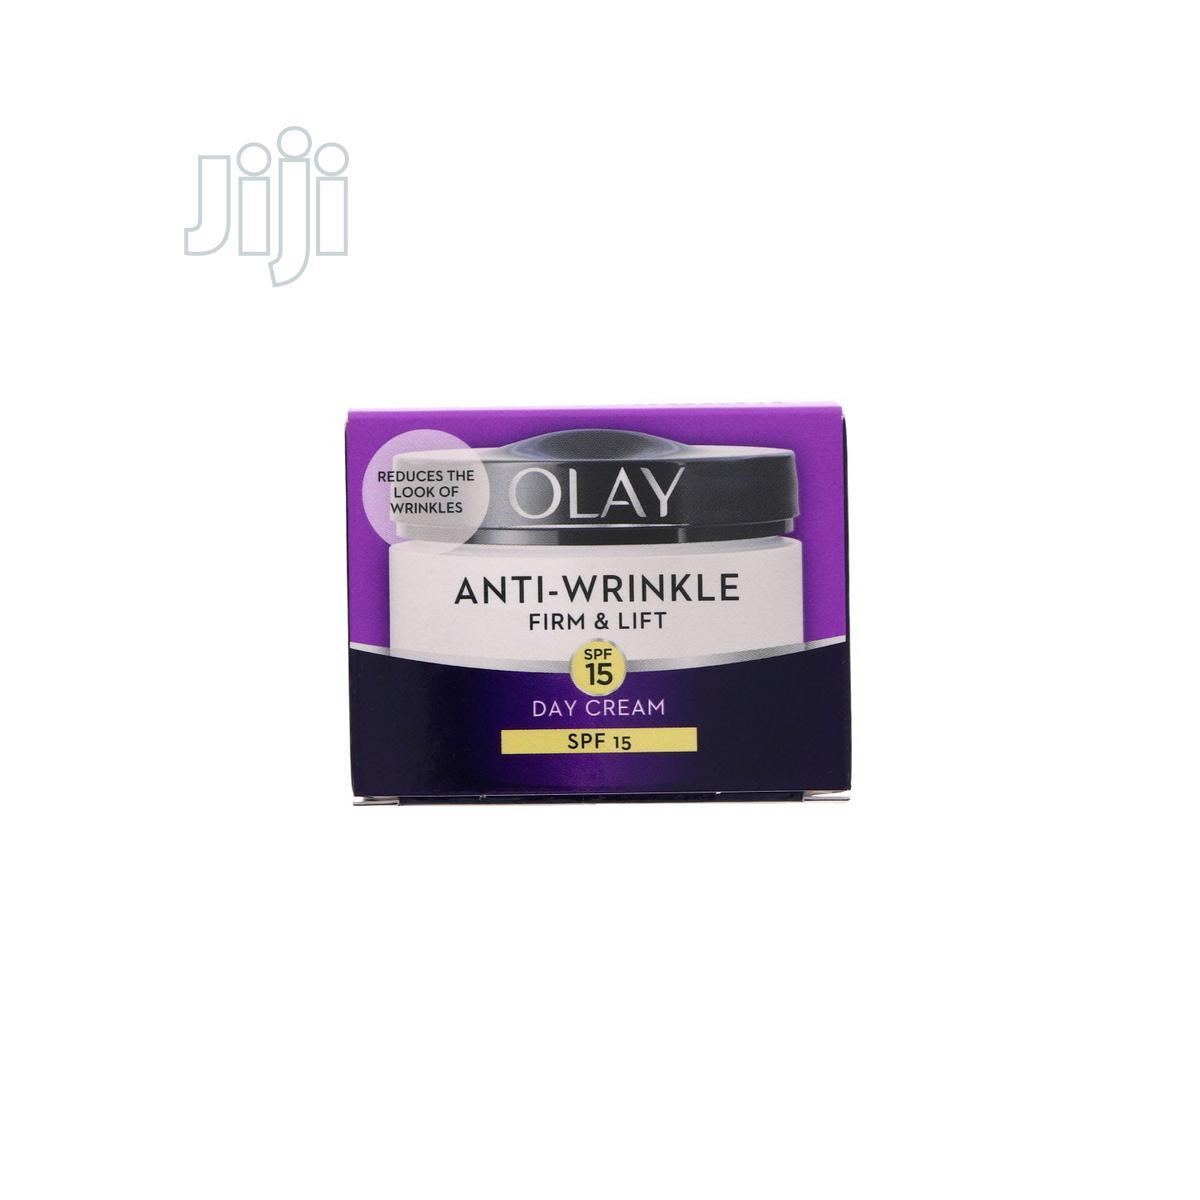 Olay Anti-Wrinkle Firm Lift SPF 15 Day Cream 50ml